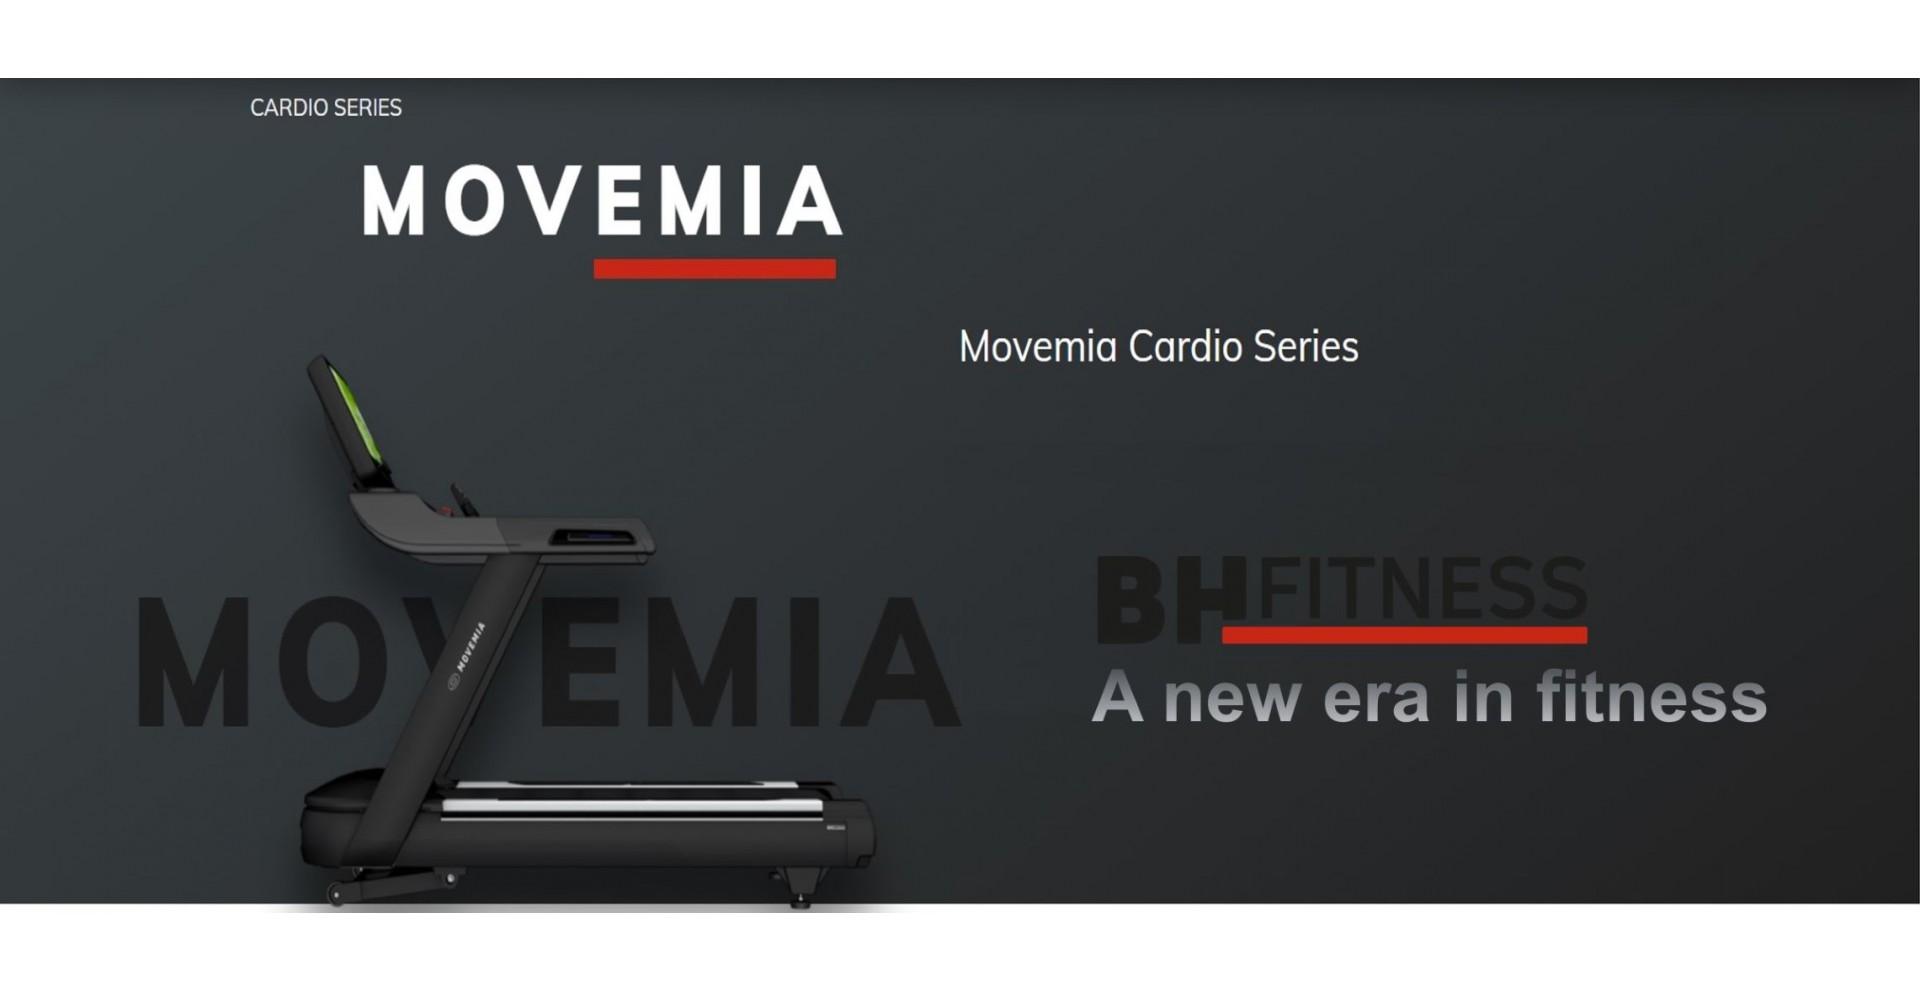 Movemia Cardio Series-BH Fitness